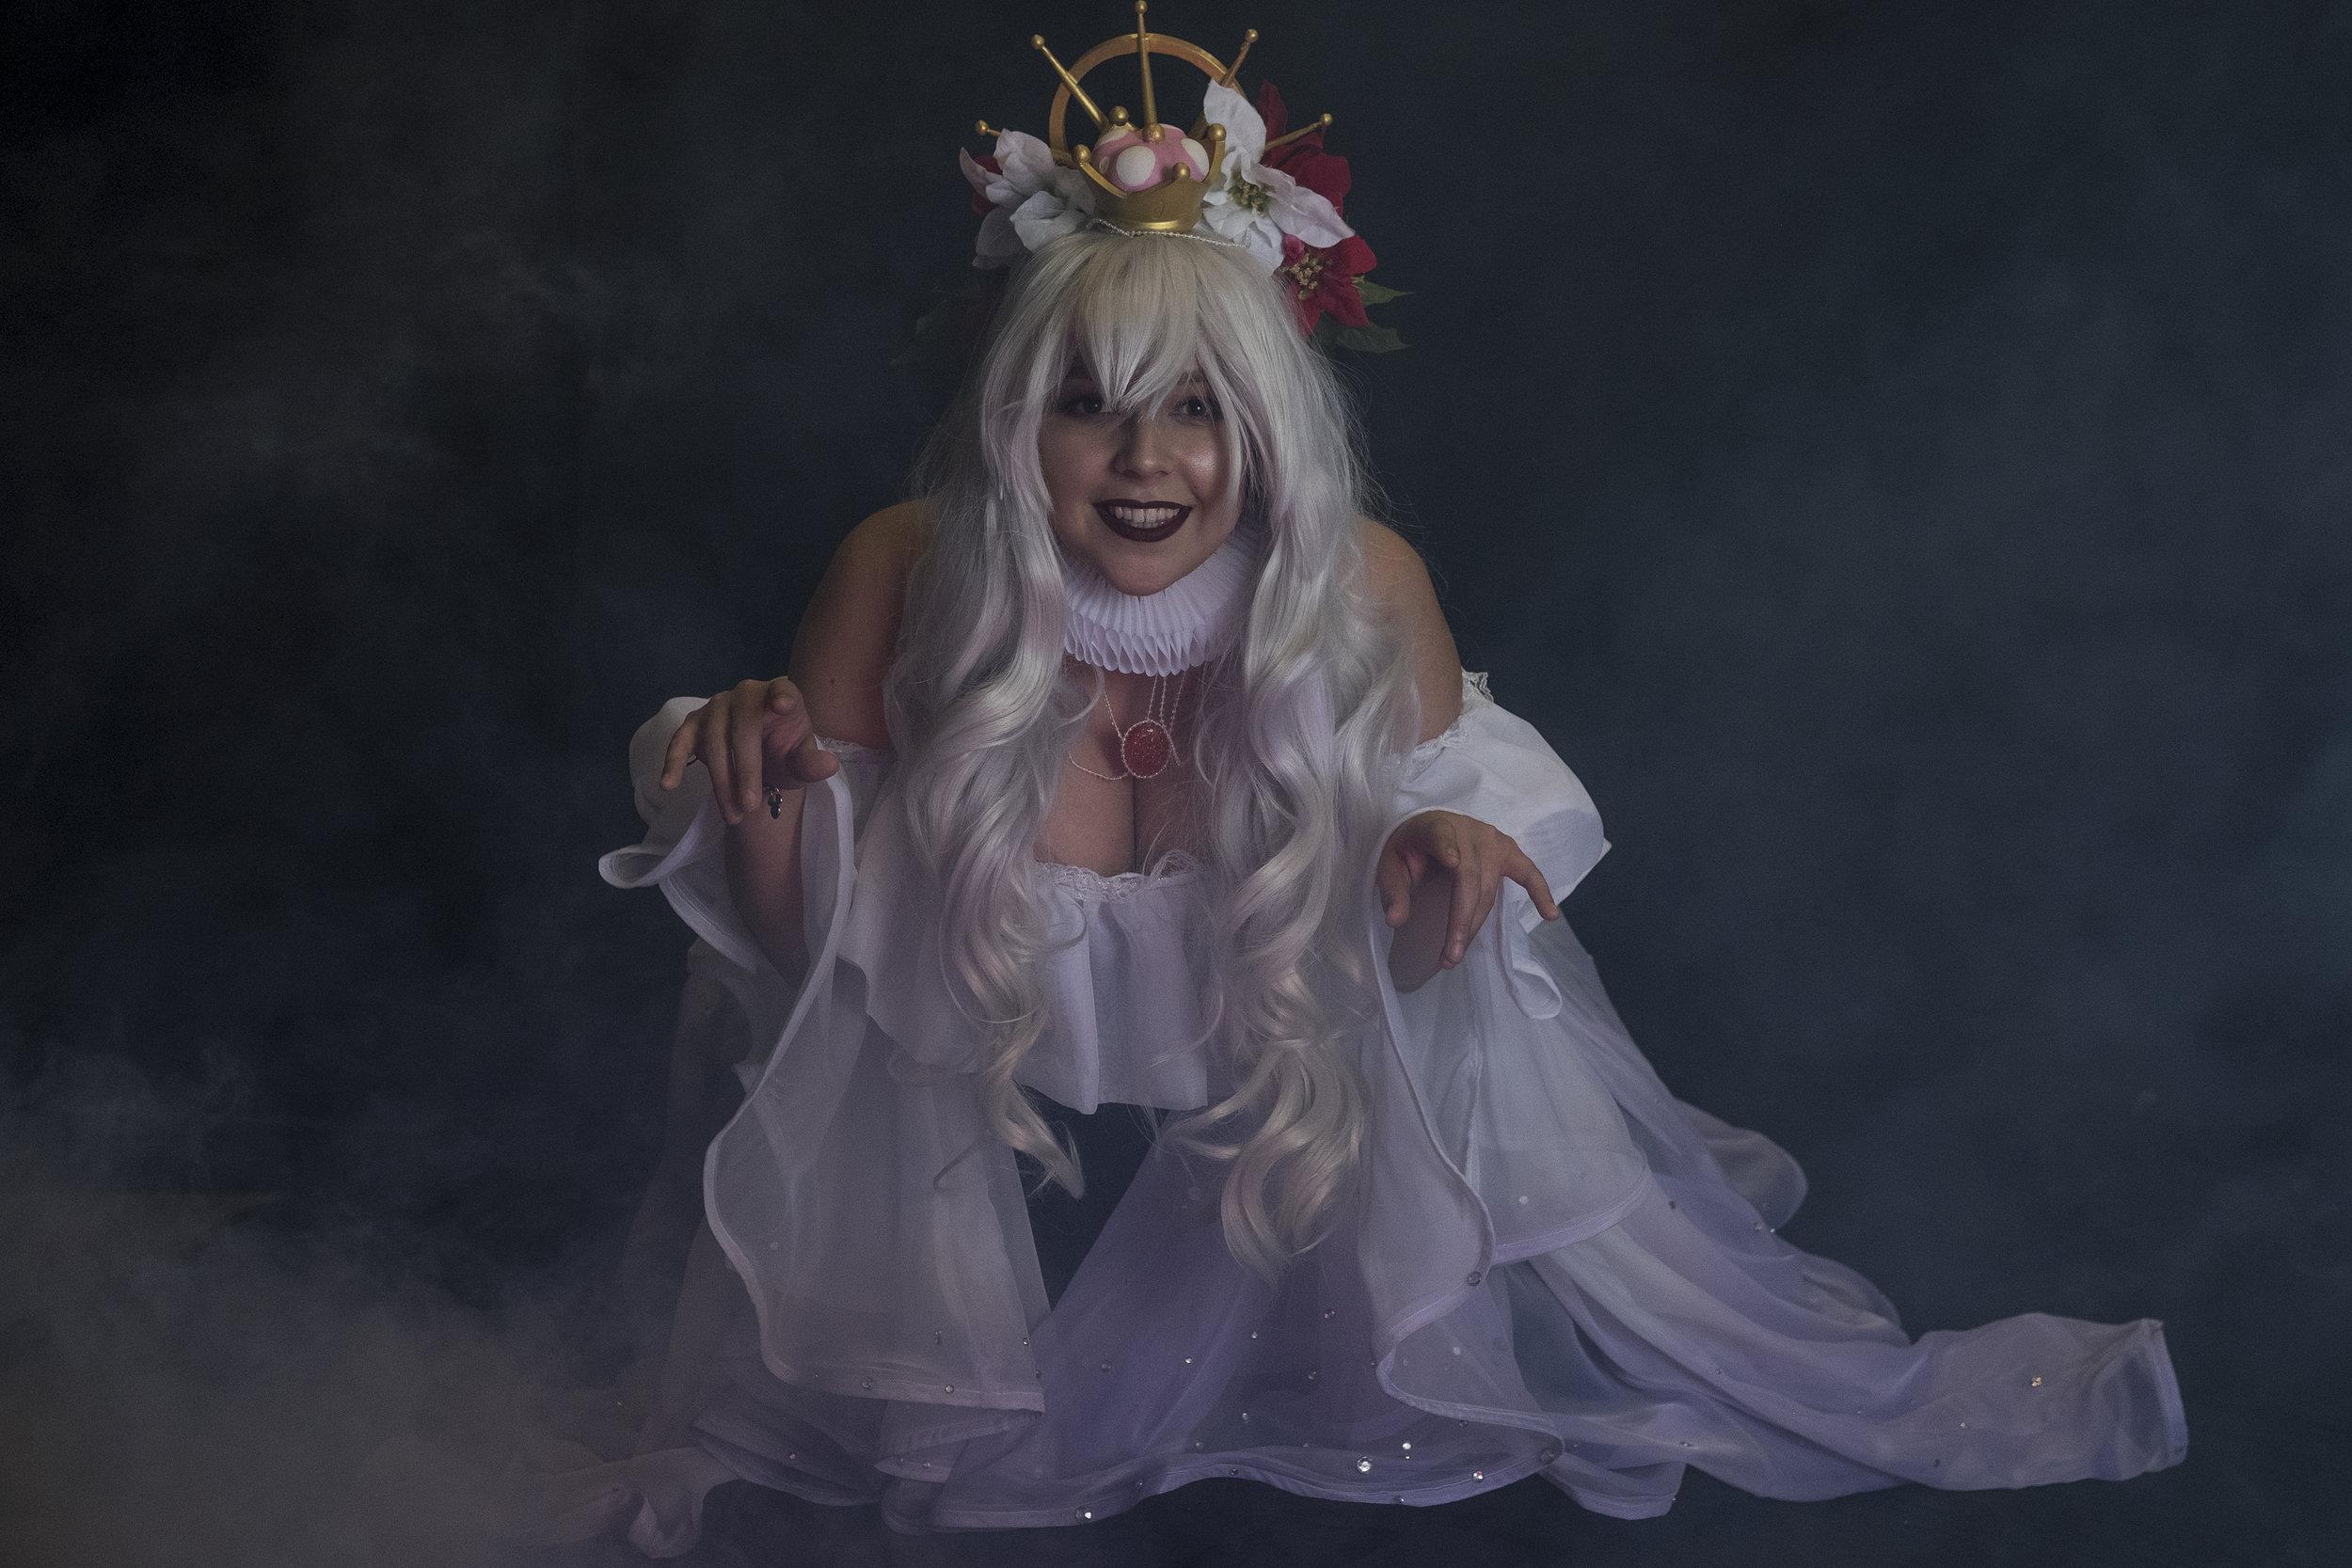 Mermaid Child cosplaying as Hannah Alexander's Boosette